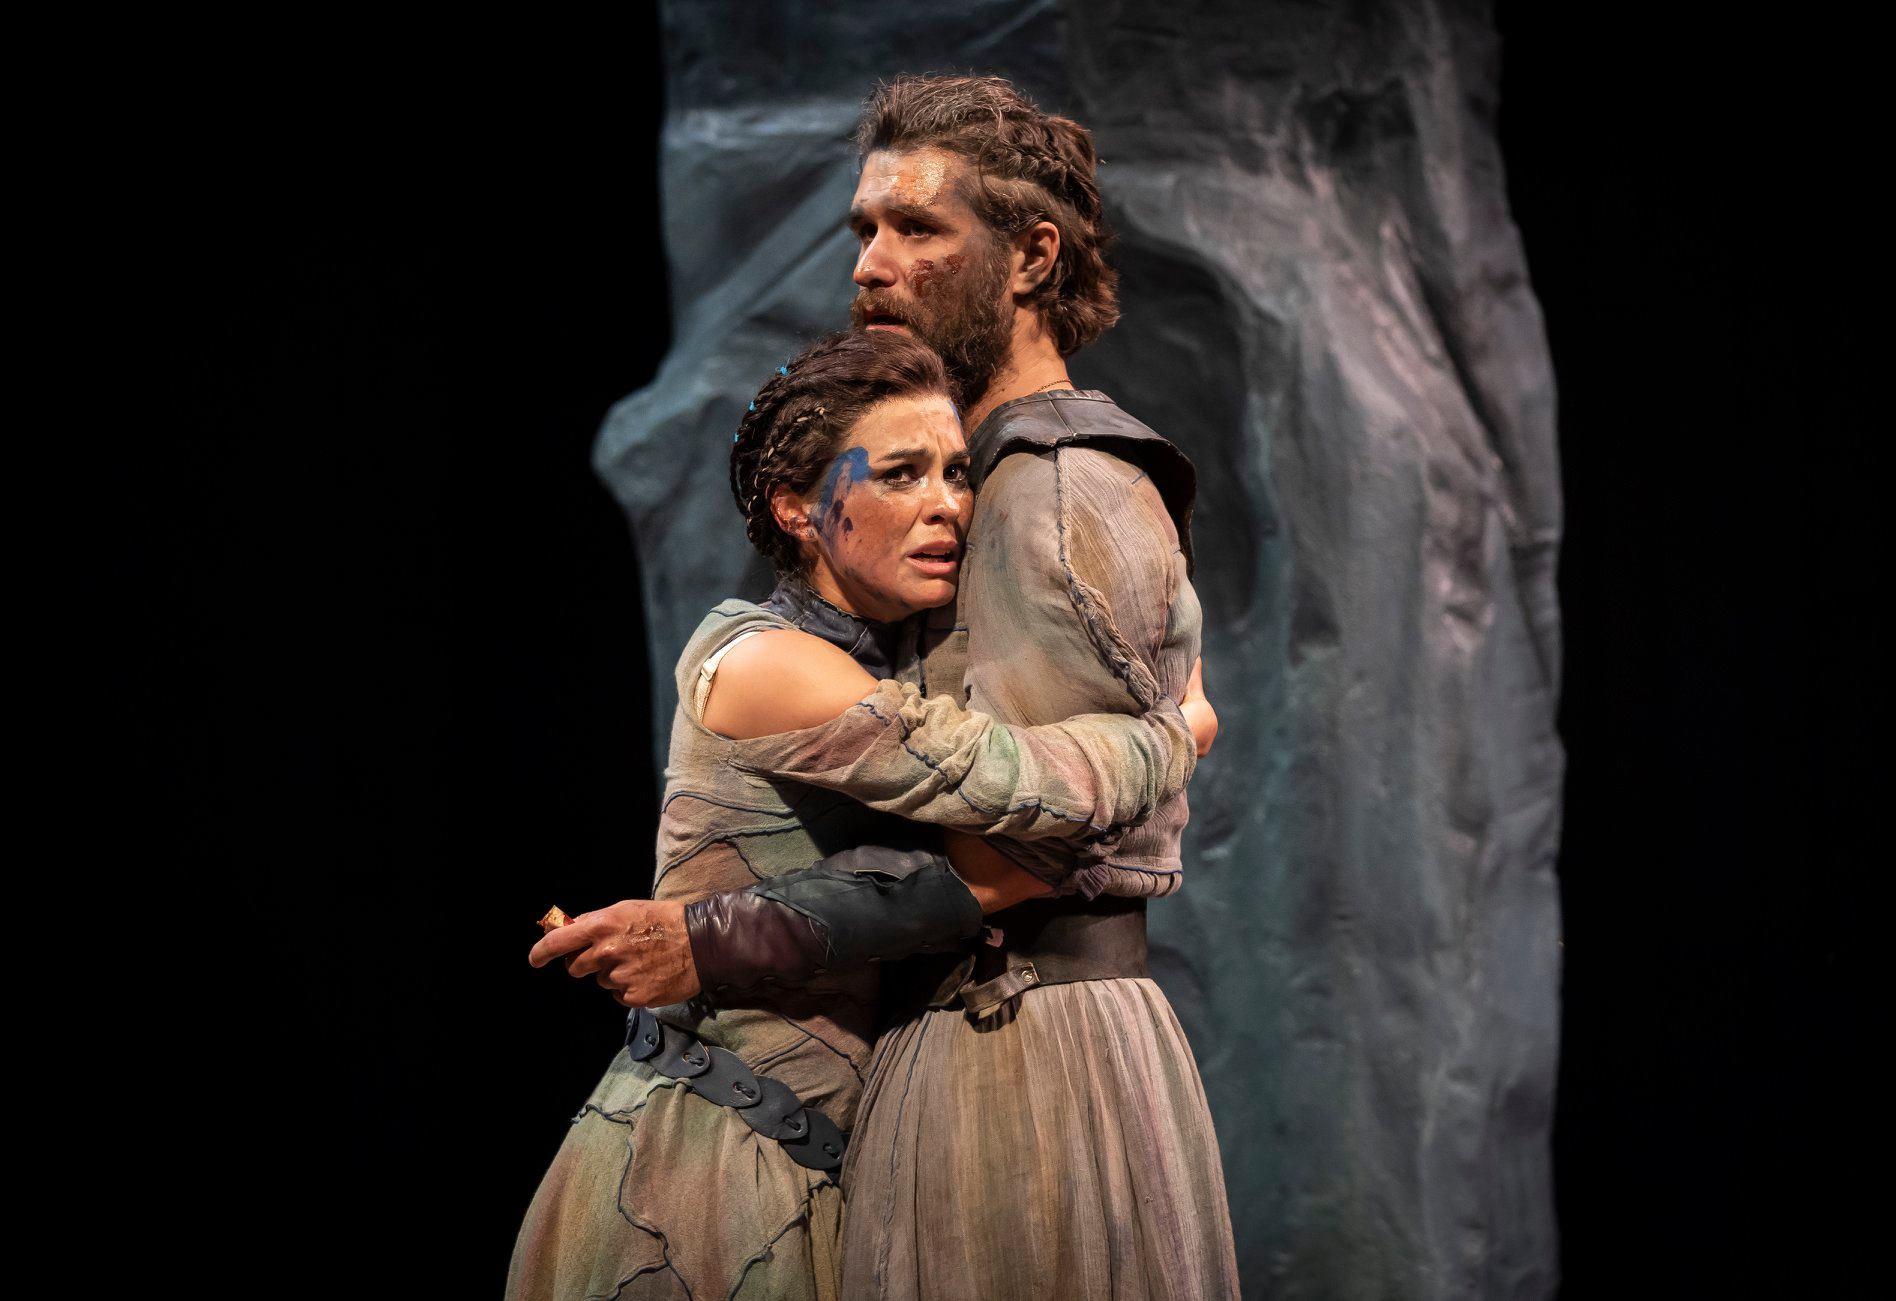 Lady Macbeth (Melisa Pereyra) and Macbeth (Marcus Truschinski). Photo by Liz Lauren.